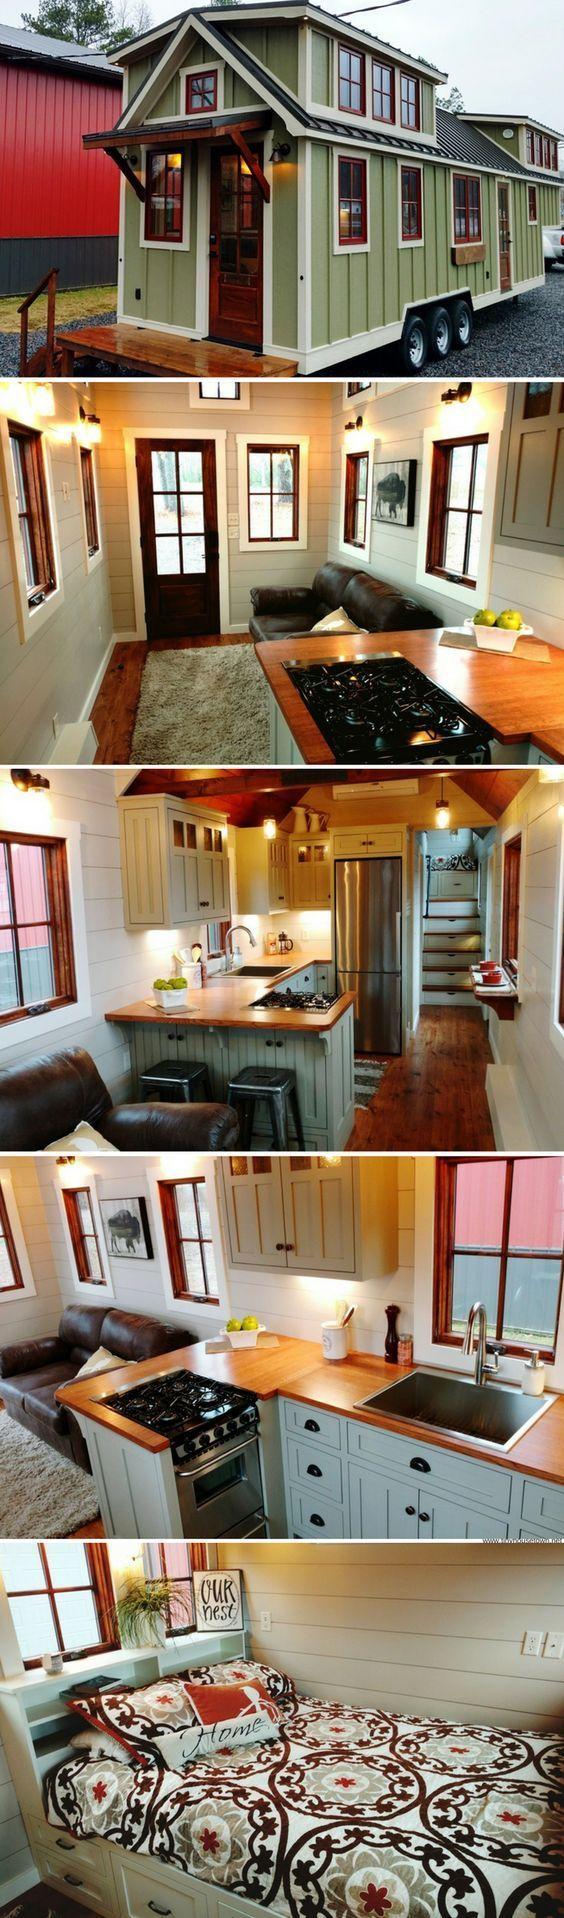 A luxury 352 sq ft farmhouse from Timbercraft Tiny Homes | Tiny ...